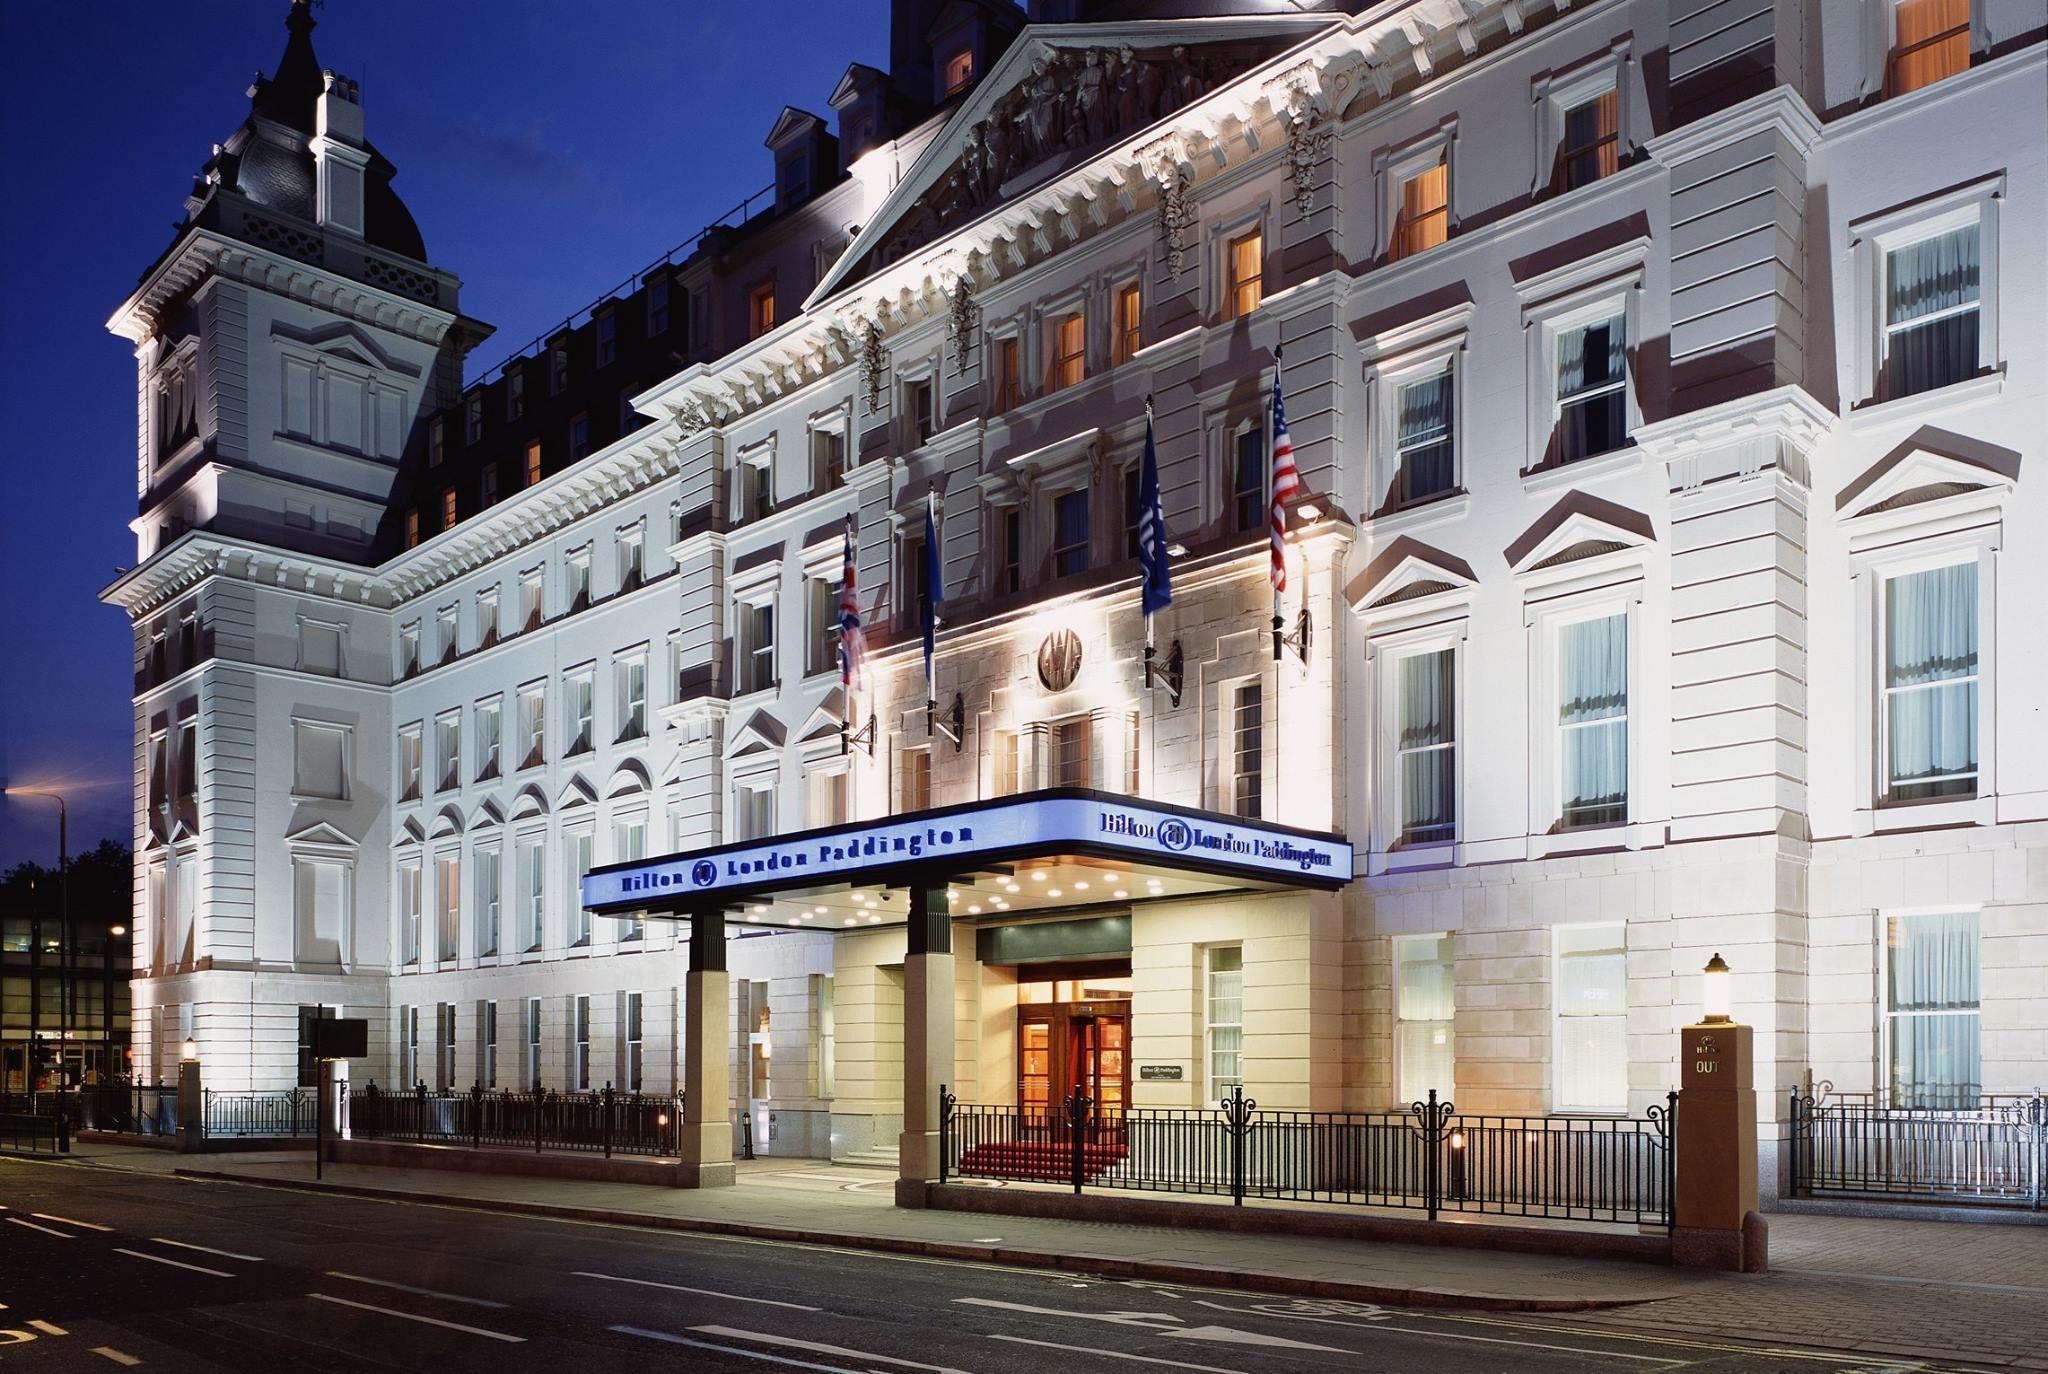 26678ac4b45e8d2299adaba125795670 - Cheap Hotels In Sussex Gardens Paddington London